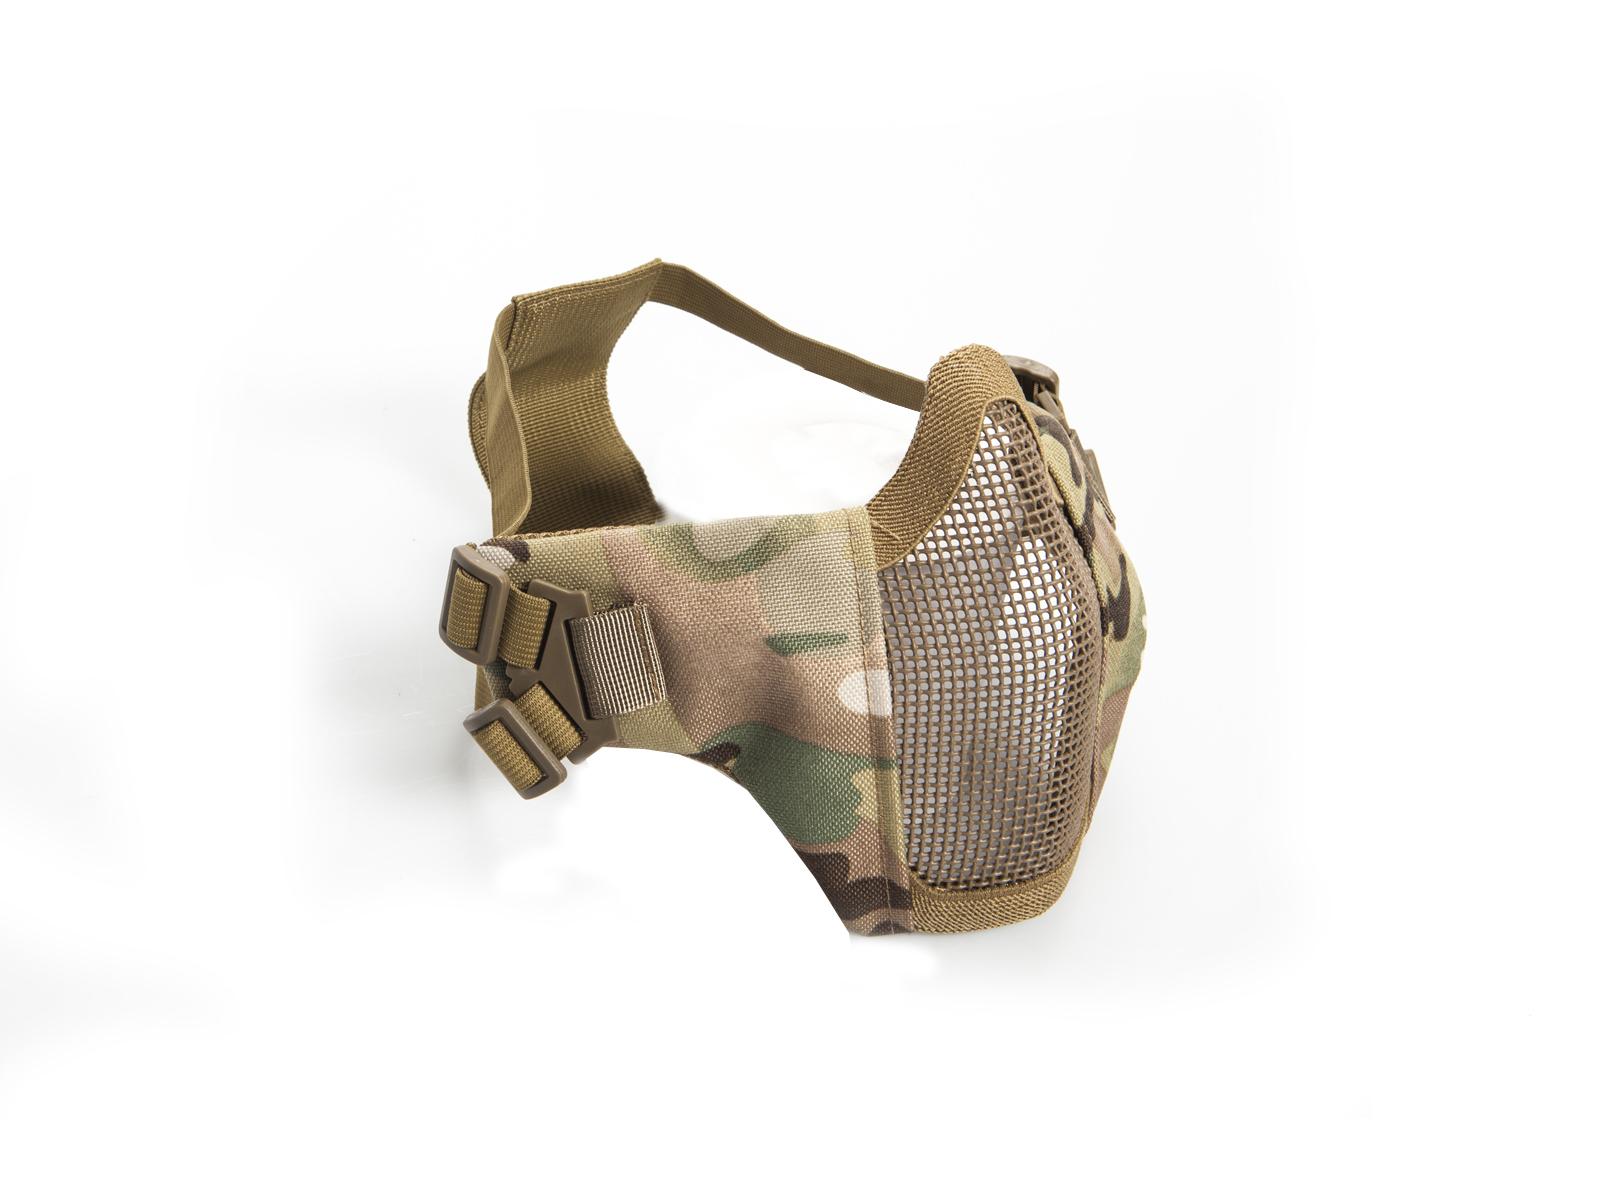 Masca De Protectie - Metalica - Multicam imagine